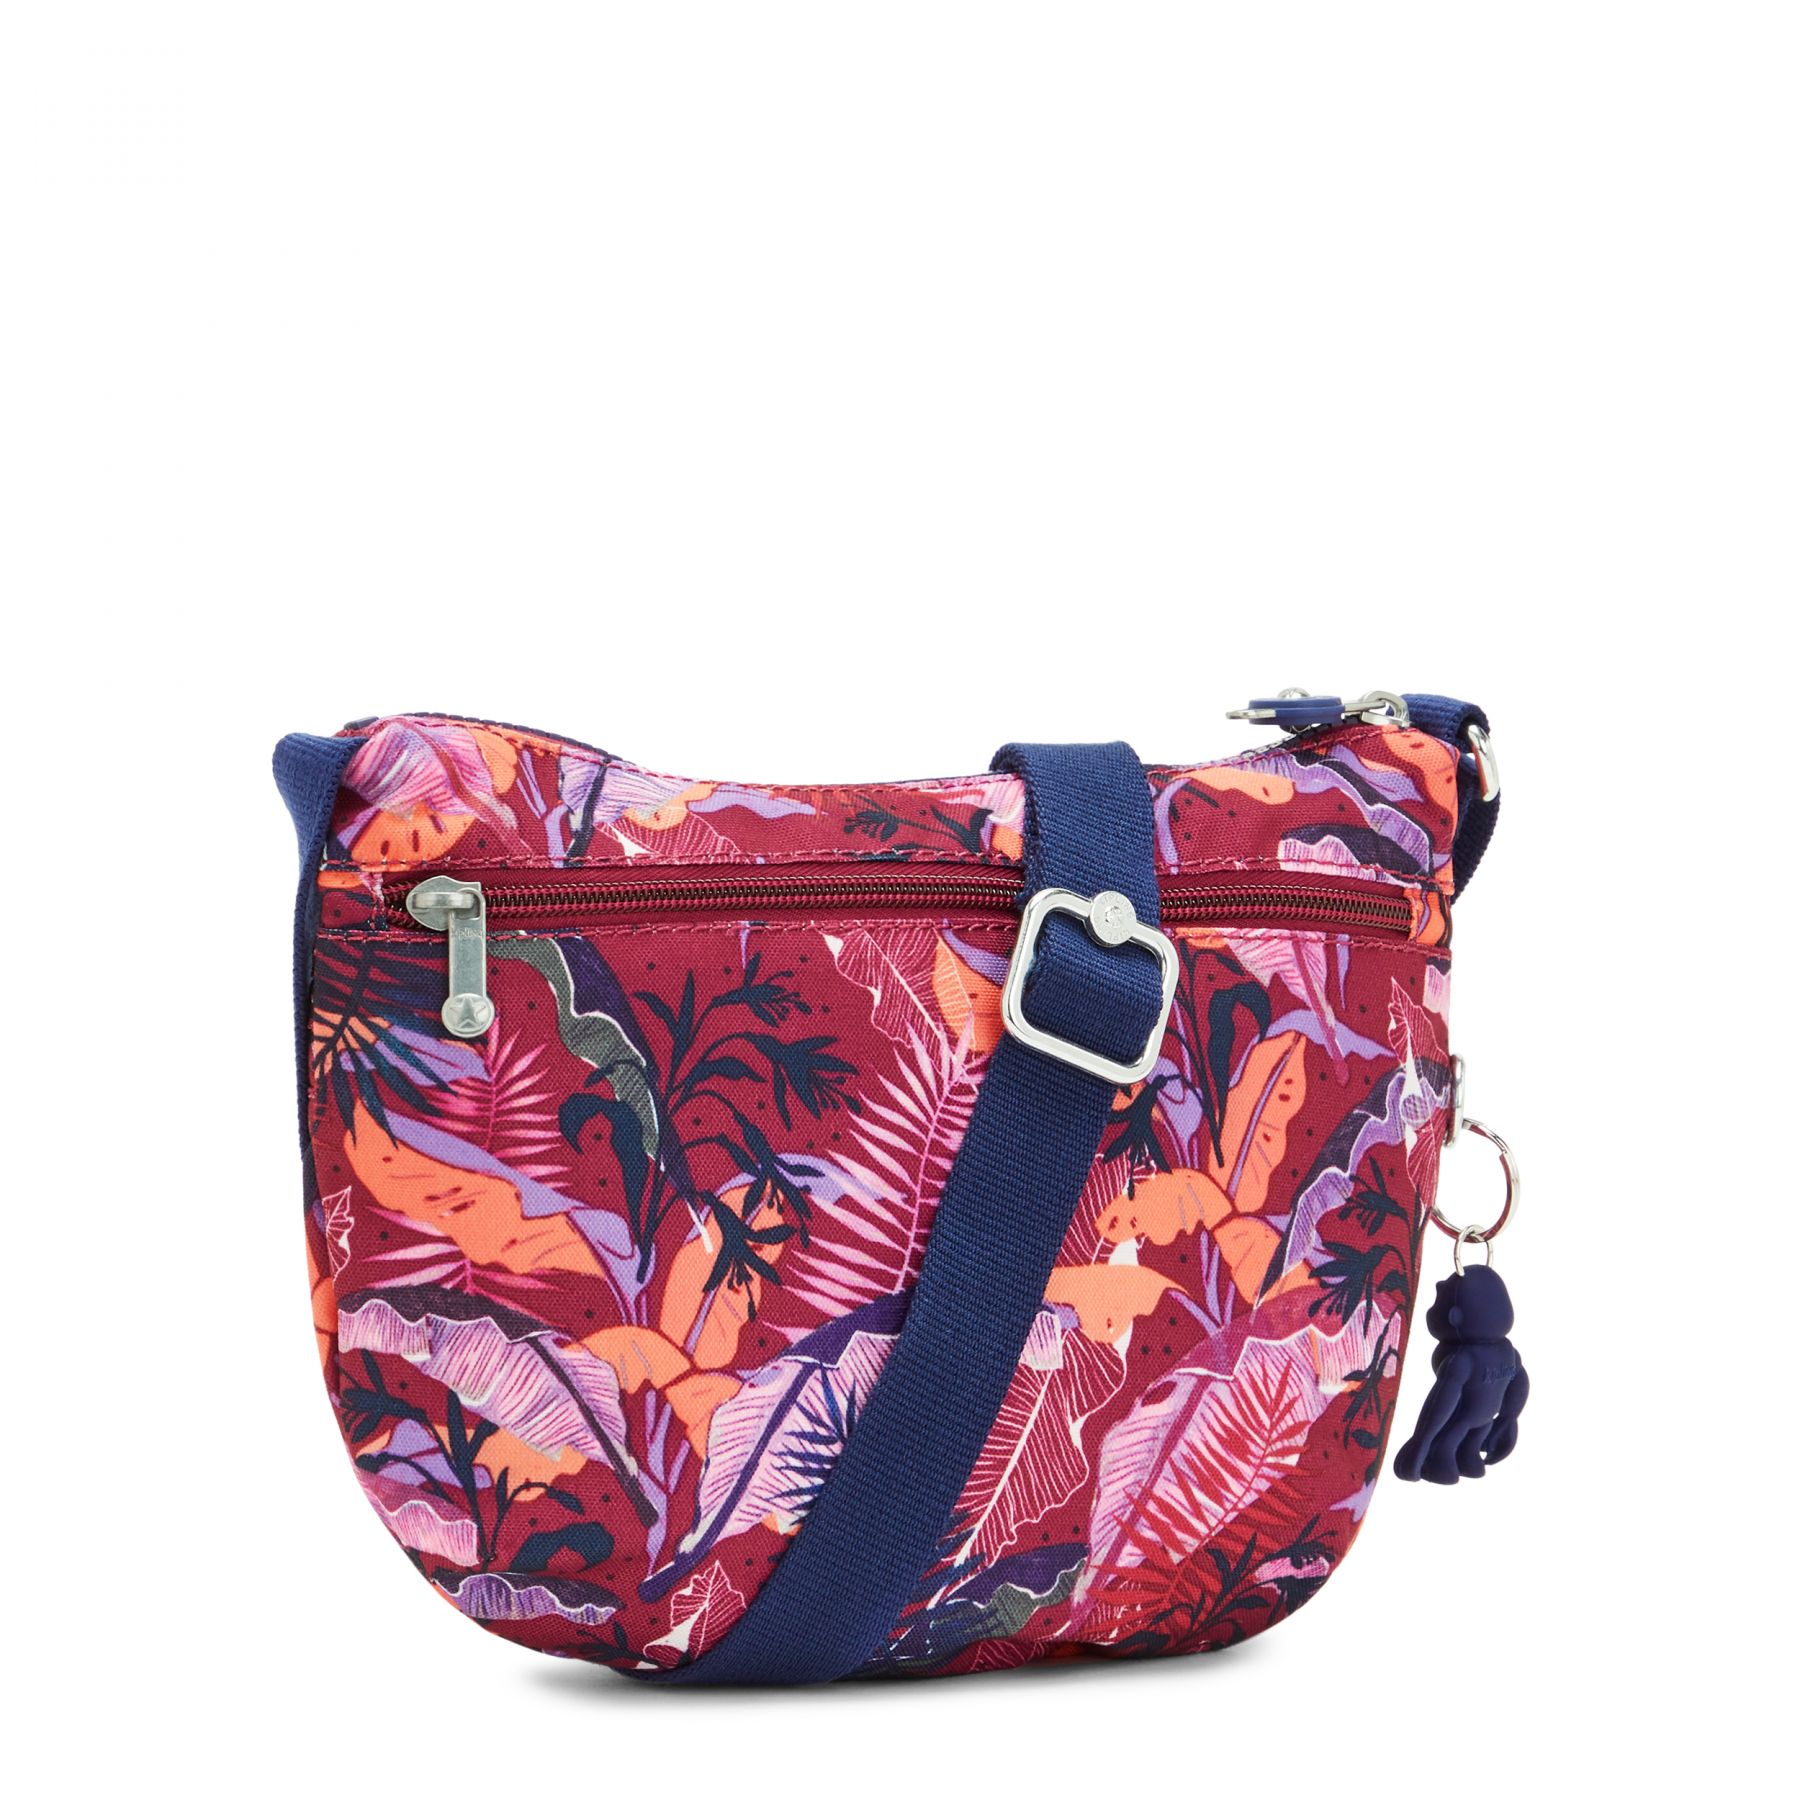 ARTO S BAGS by Kipling - Back view